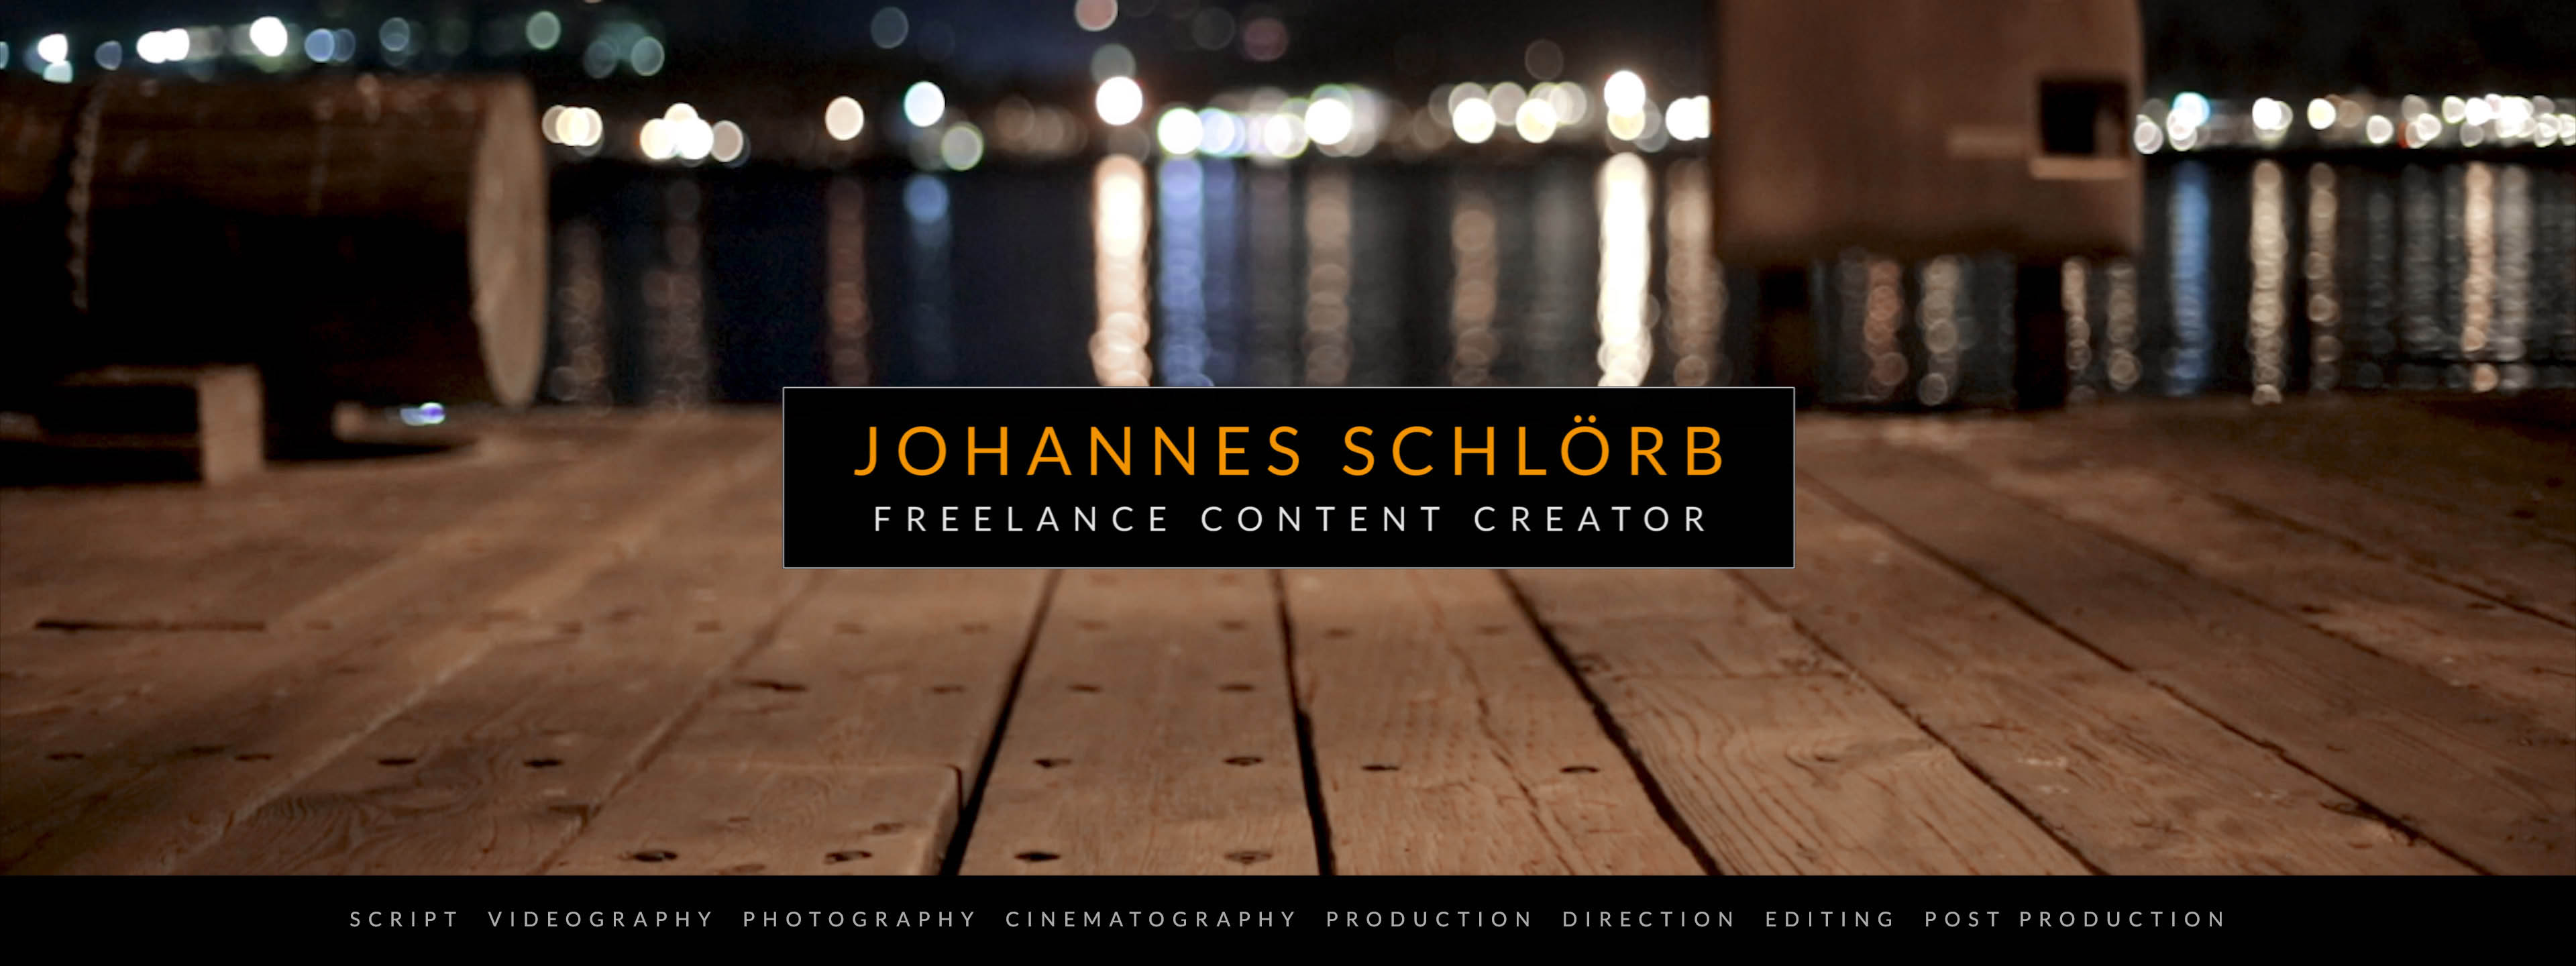 Johannes Schlörb